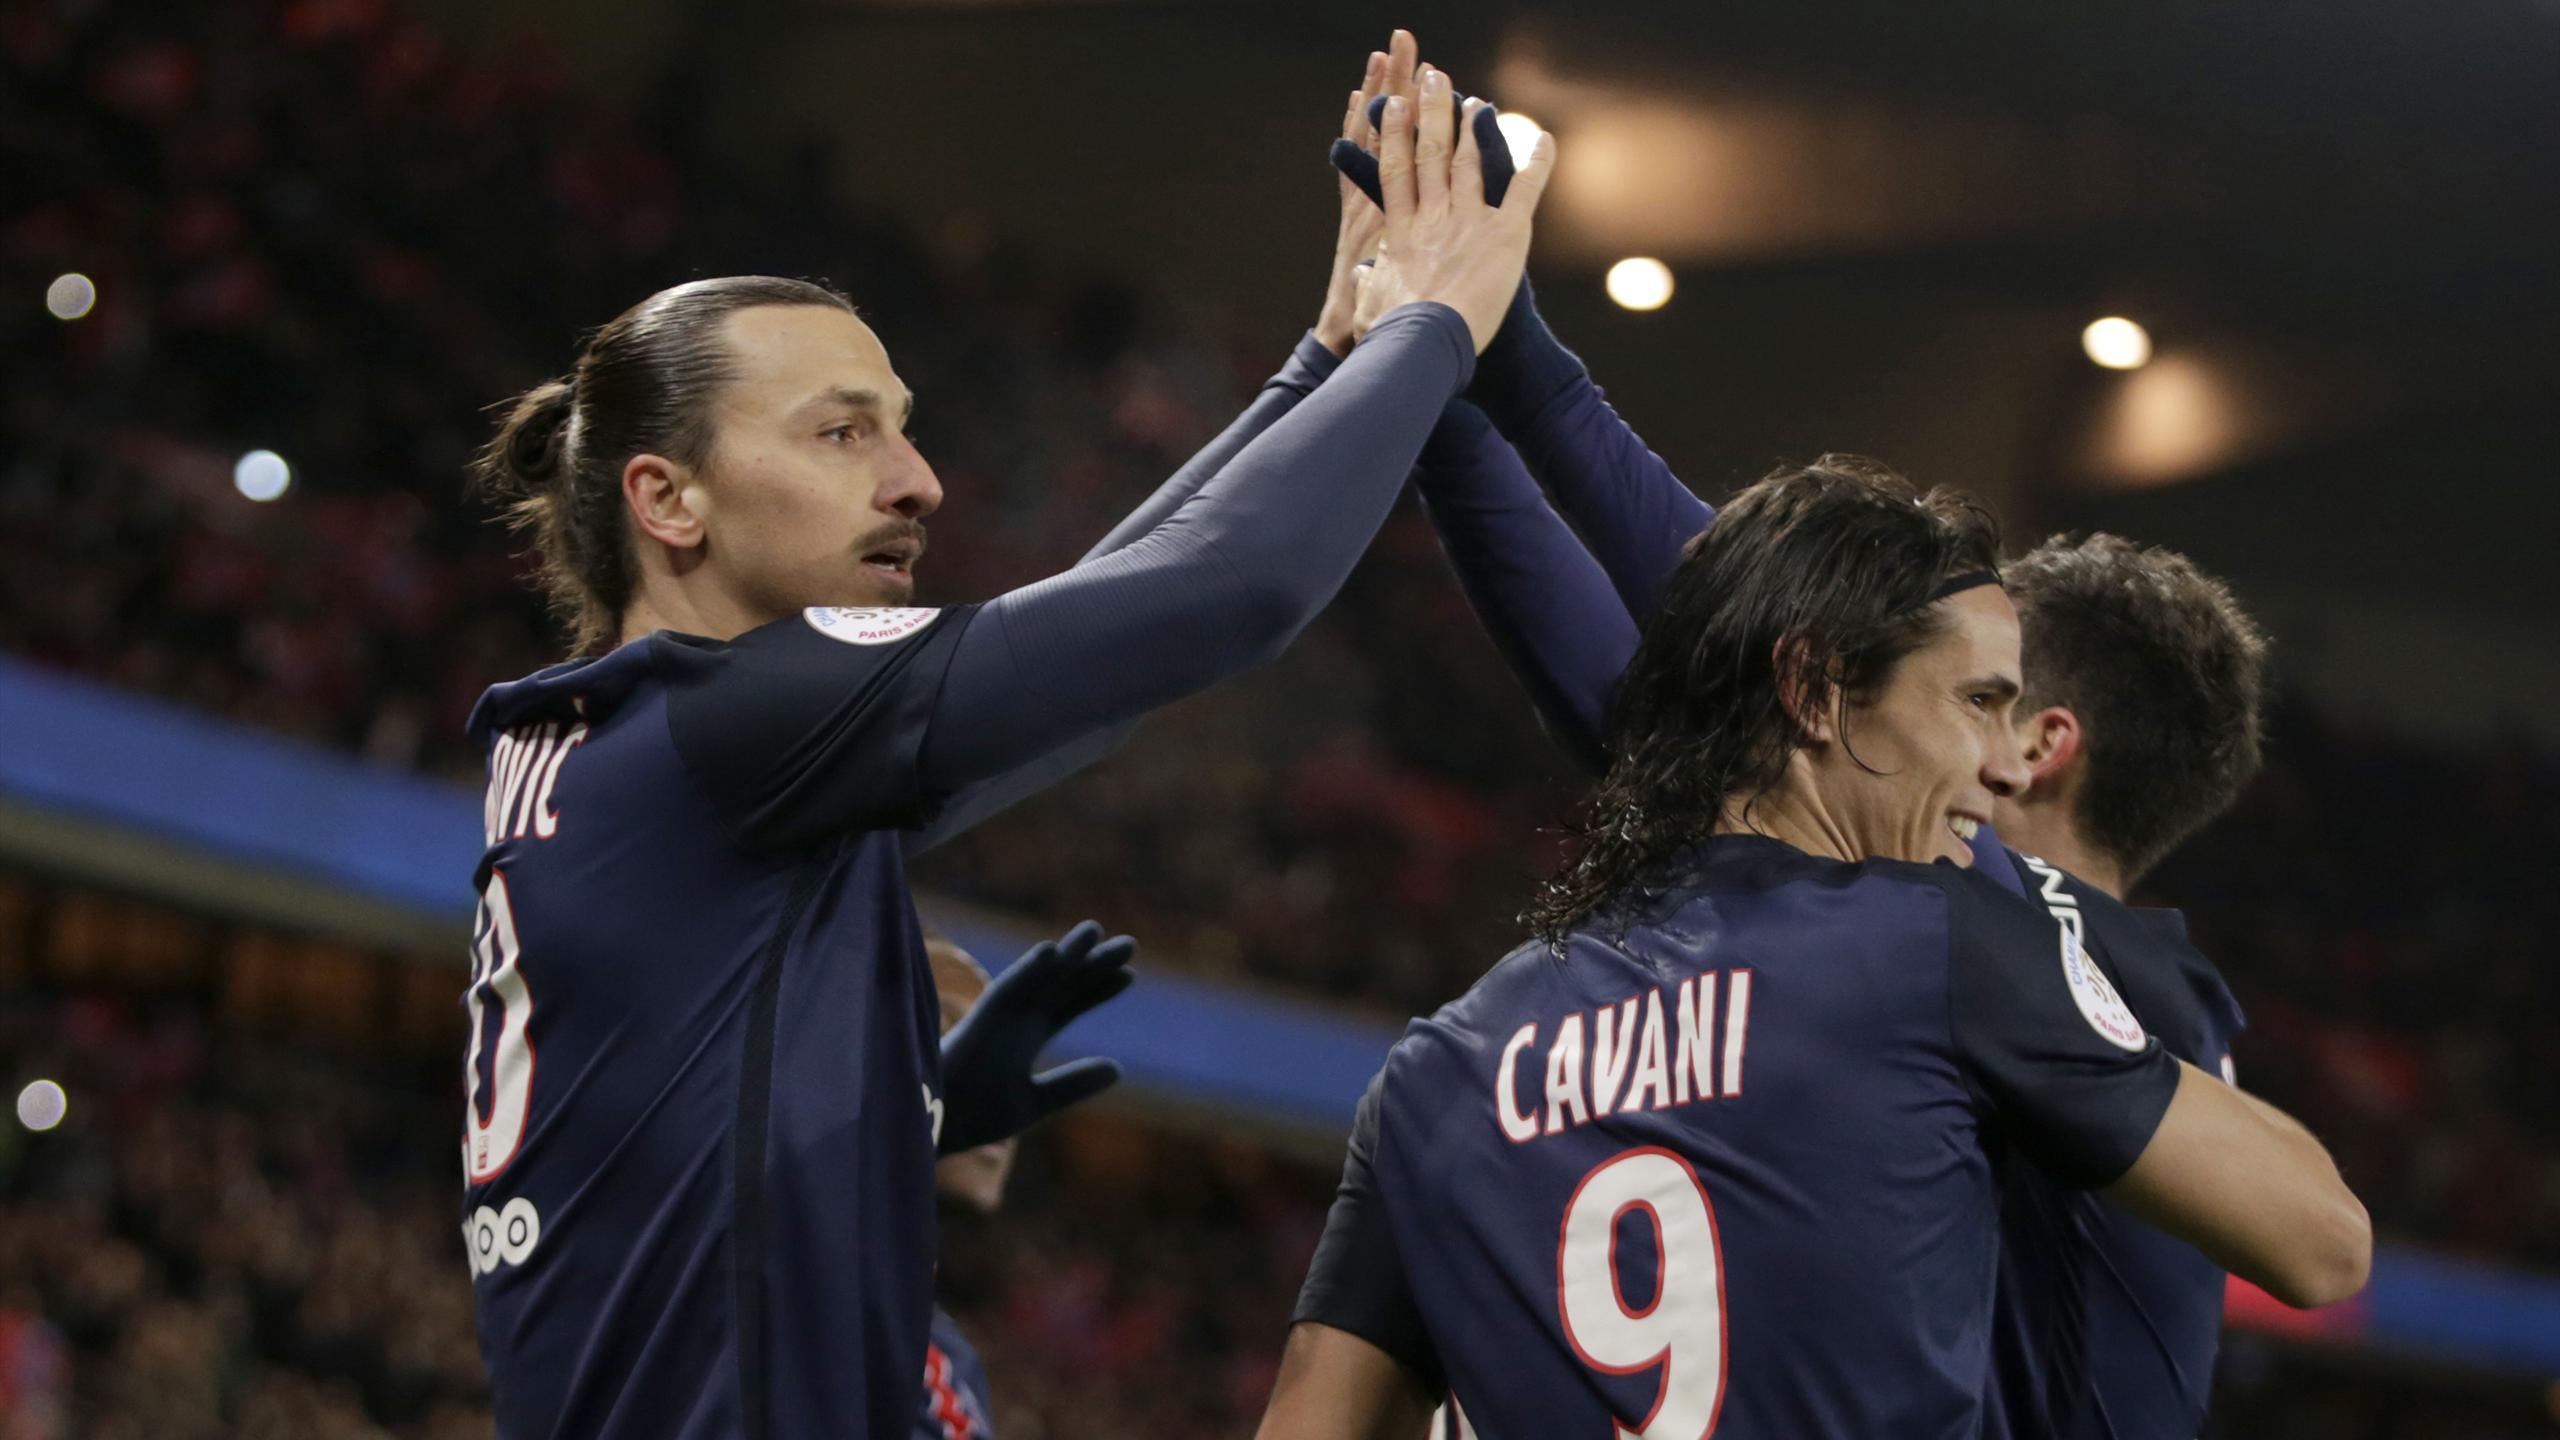 Ibrahimovic et Cavani (PSG) en janvier 2016